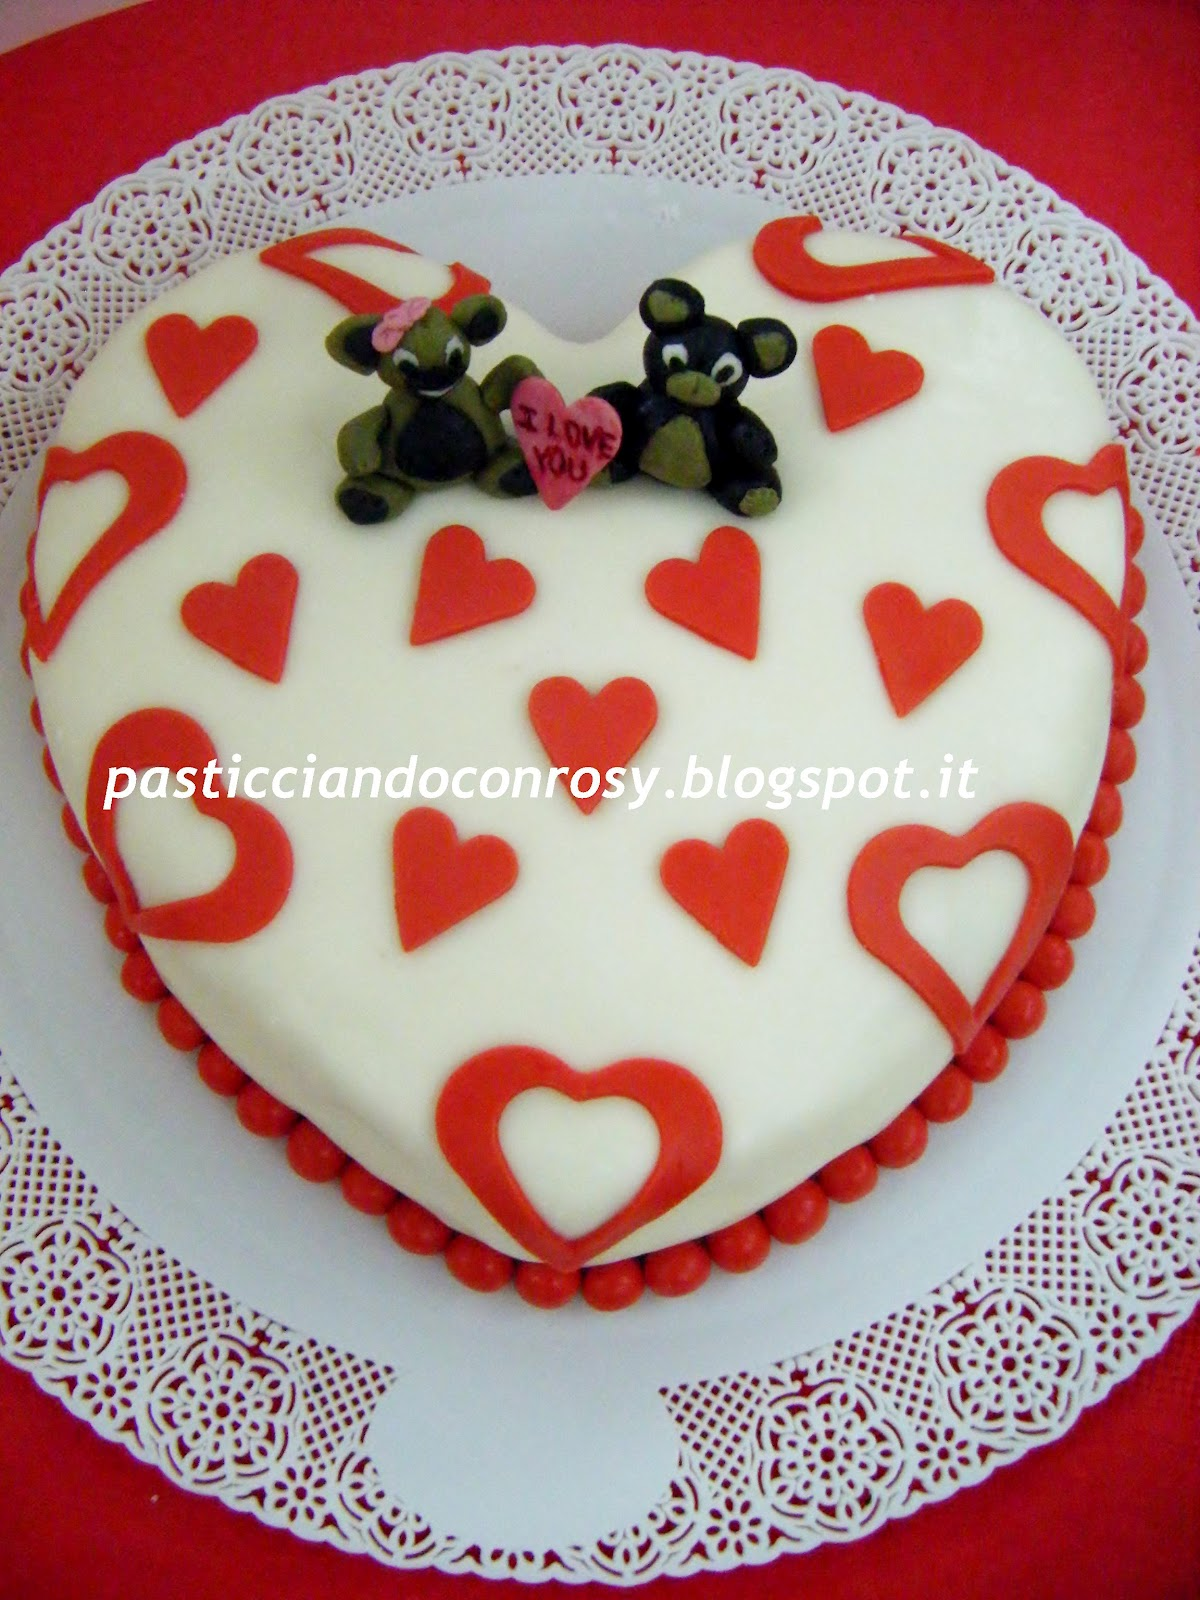 Favoloso Torta 10° anniversario - Pasticciando con Rosy EU82